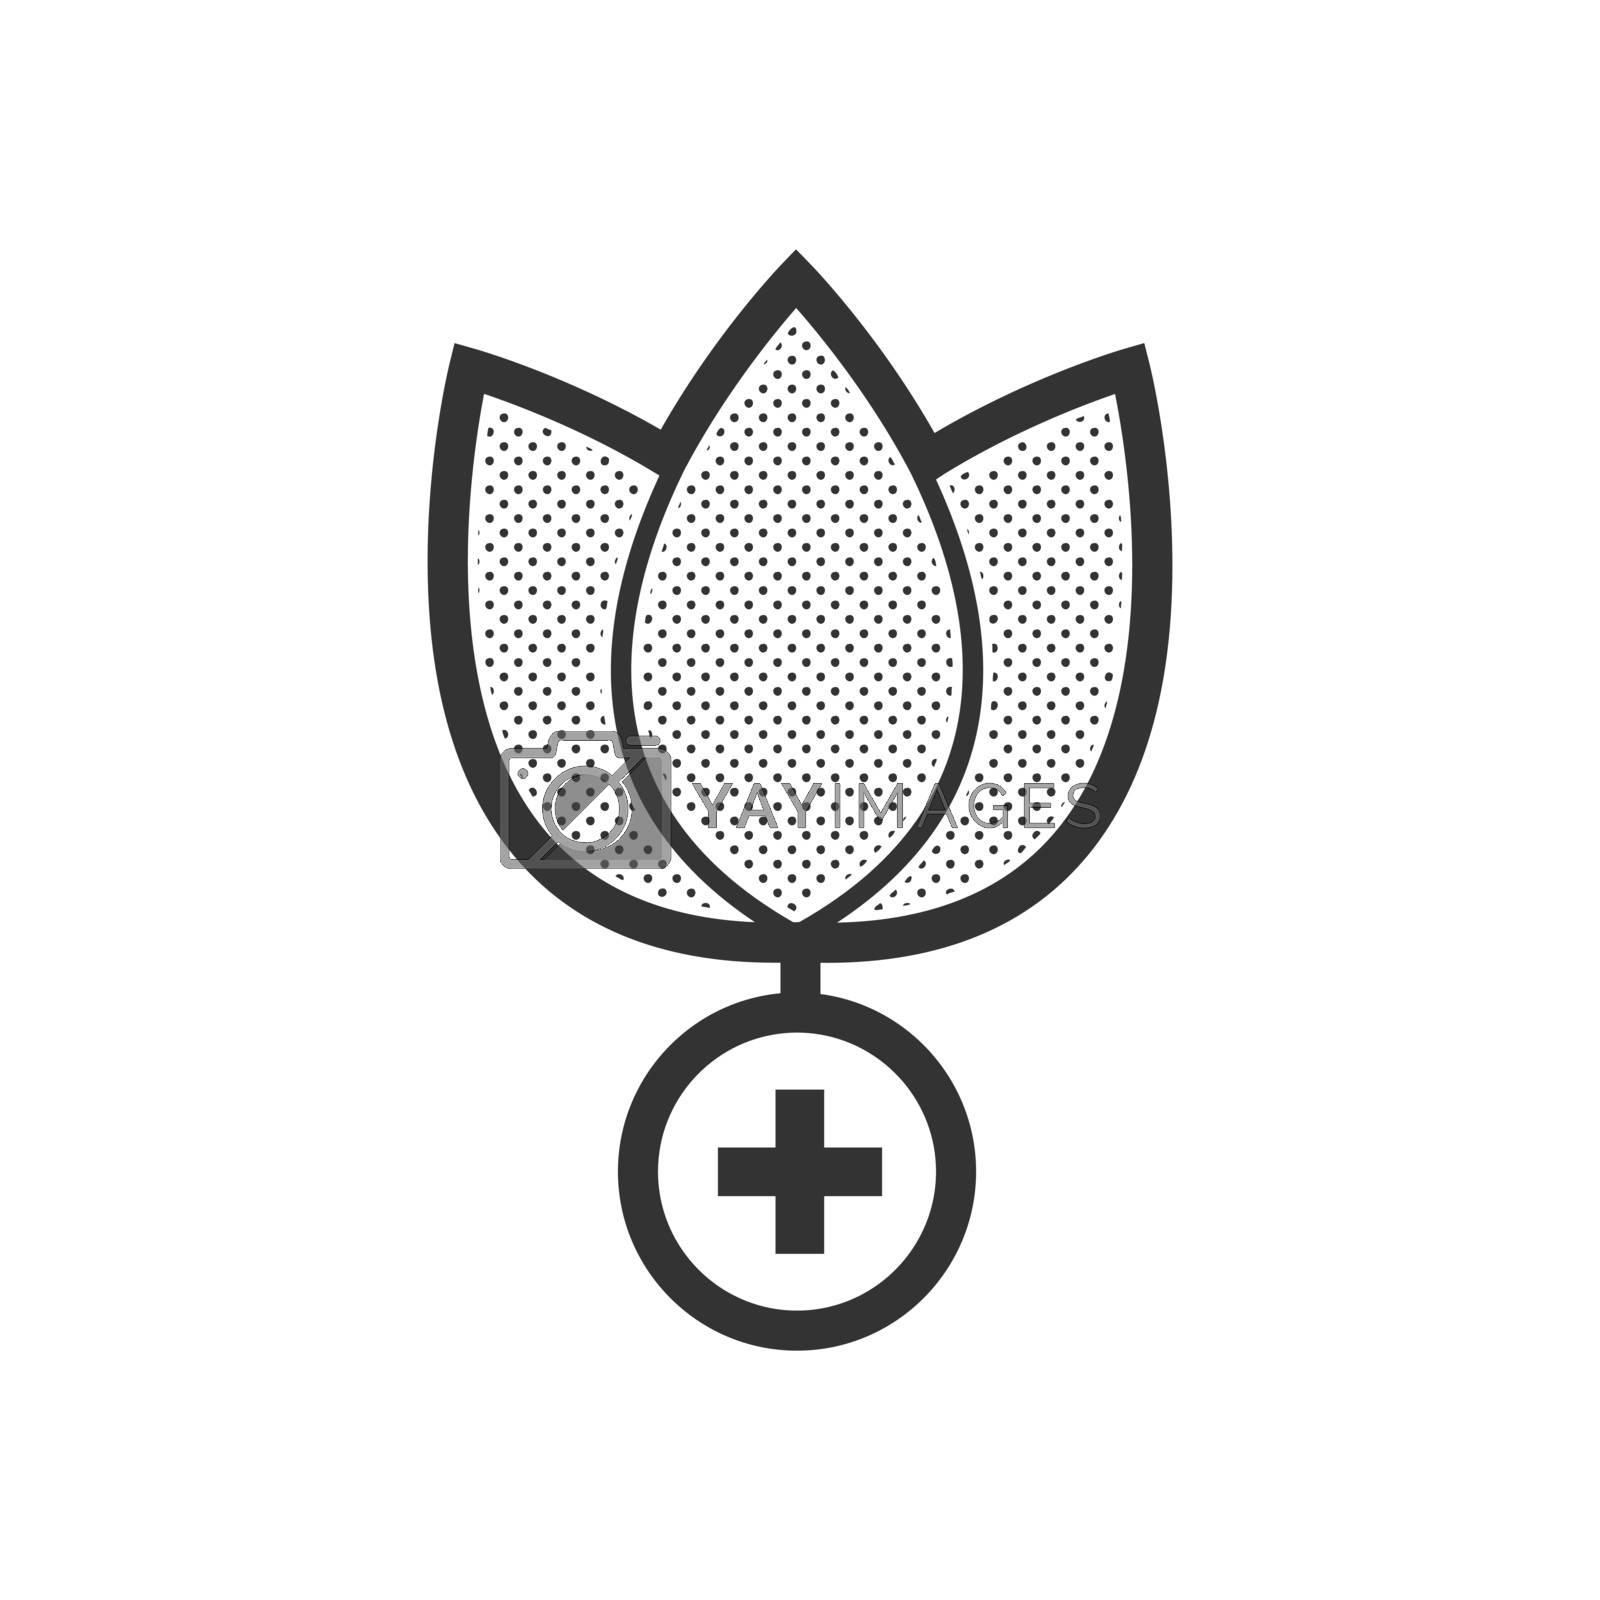 Medical Alternative logo and icons